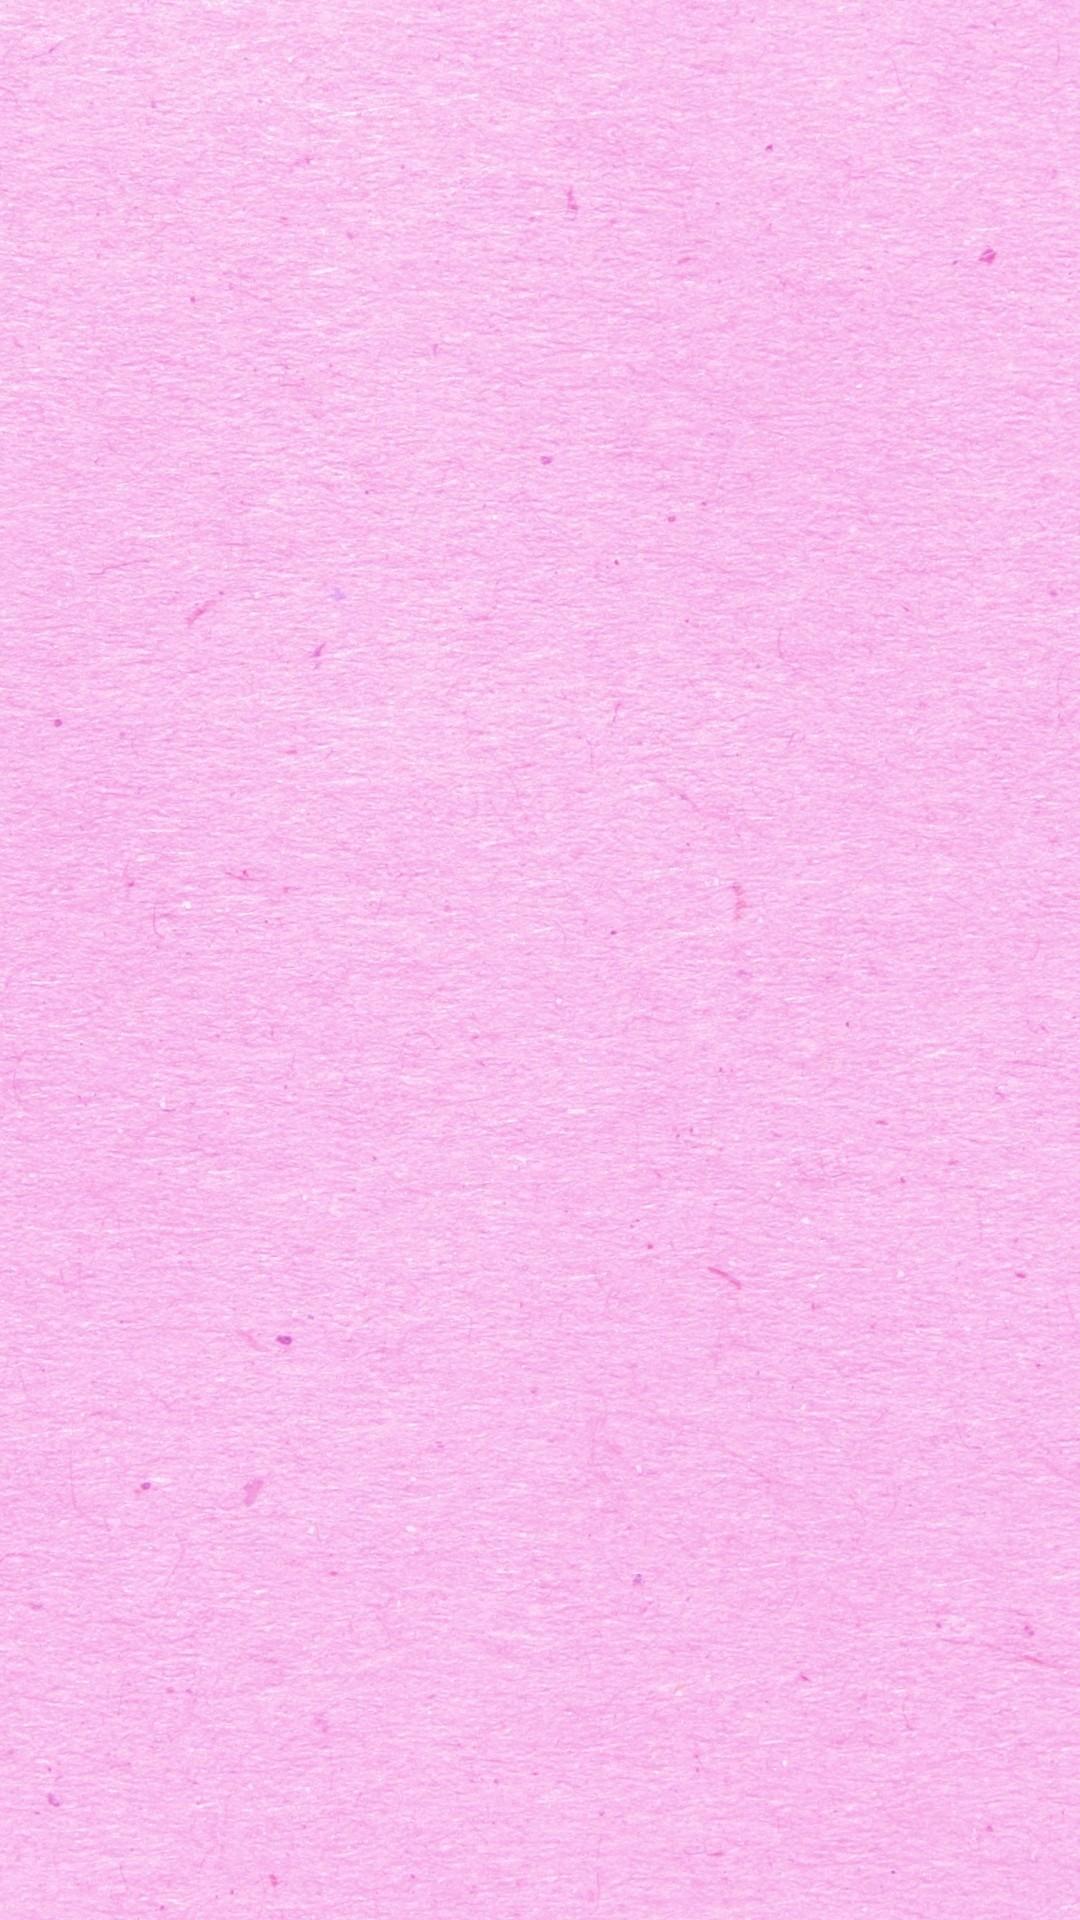 Light Pink iphone 6s plus wallpaper